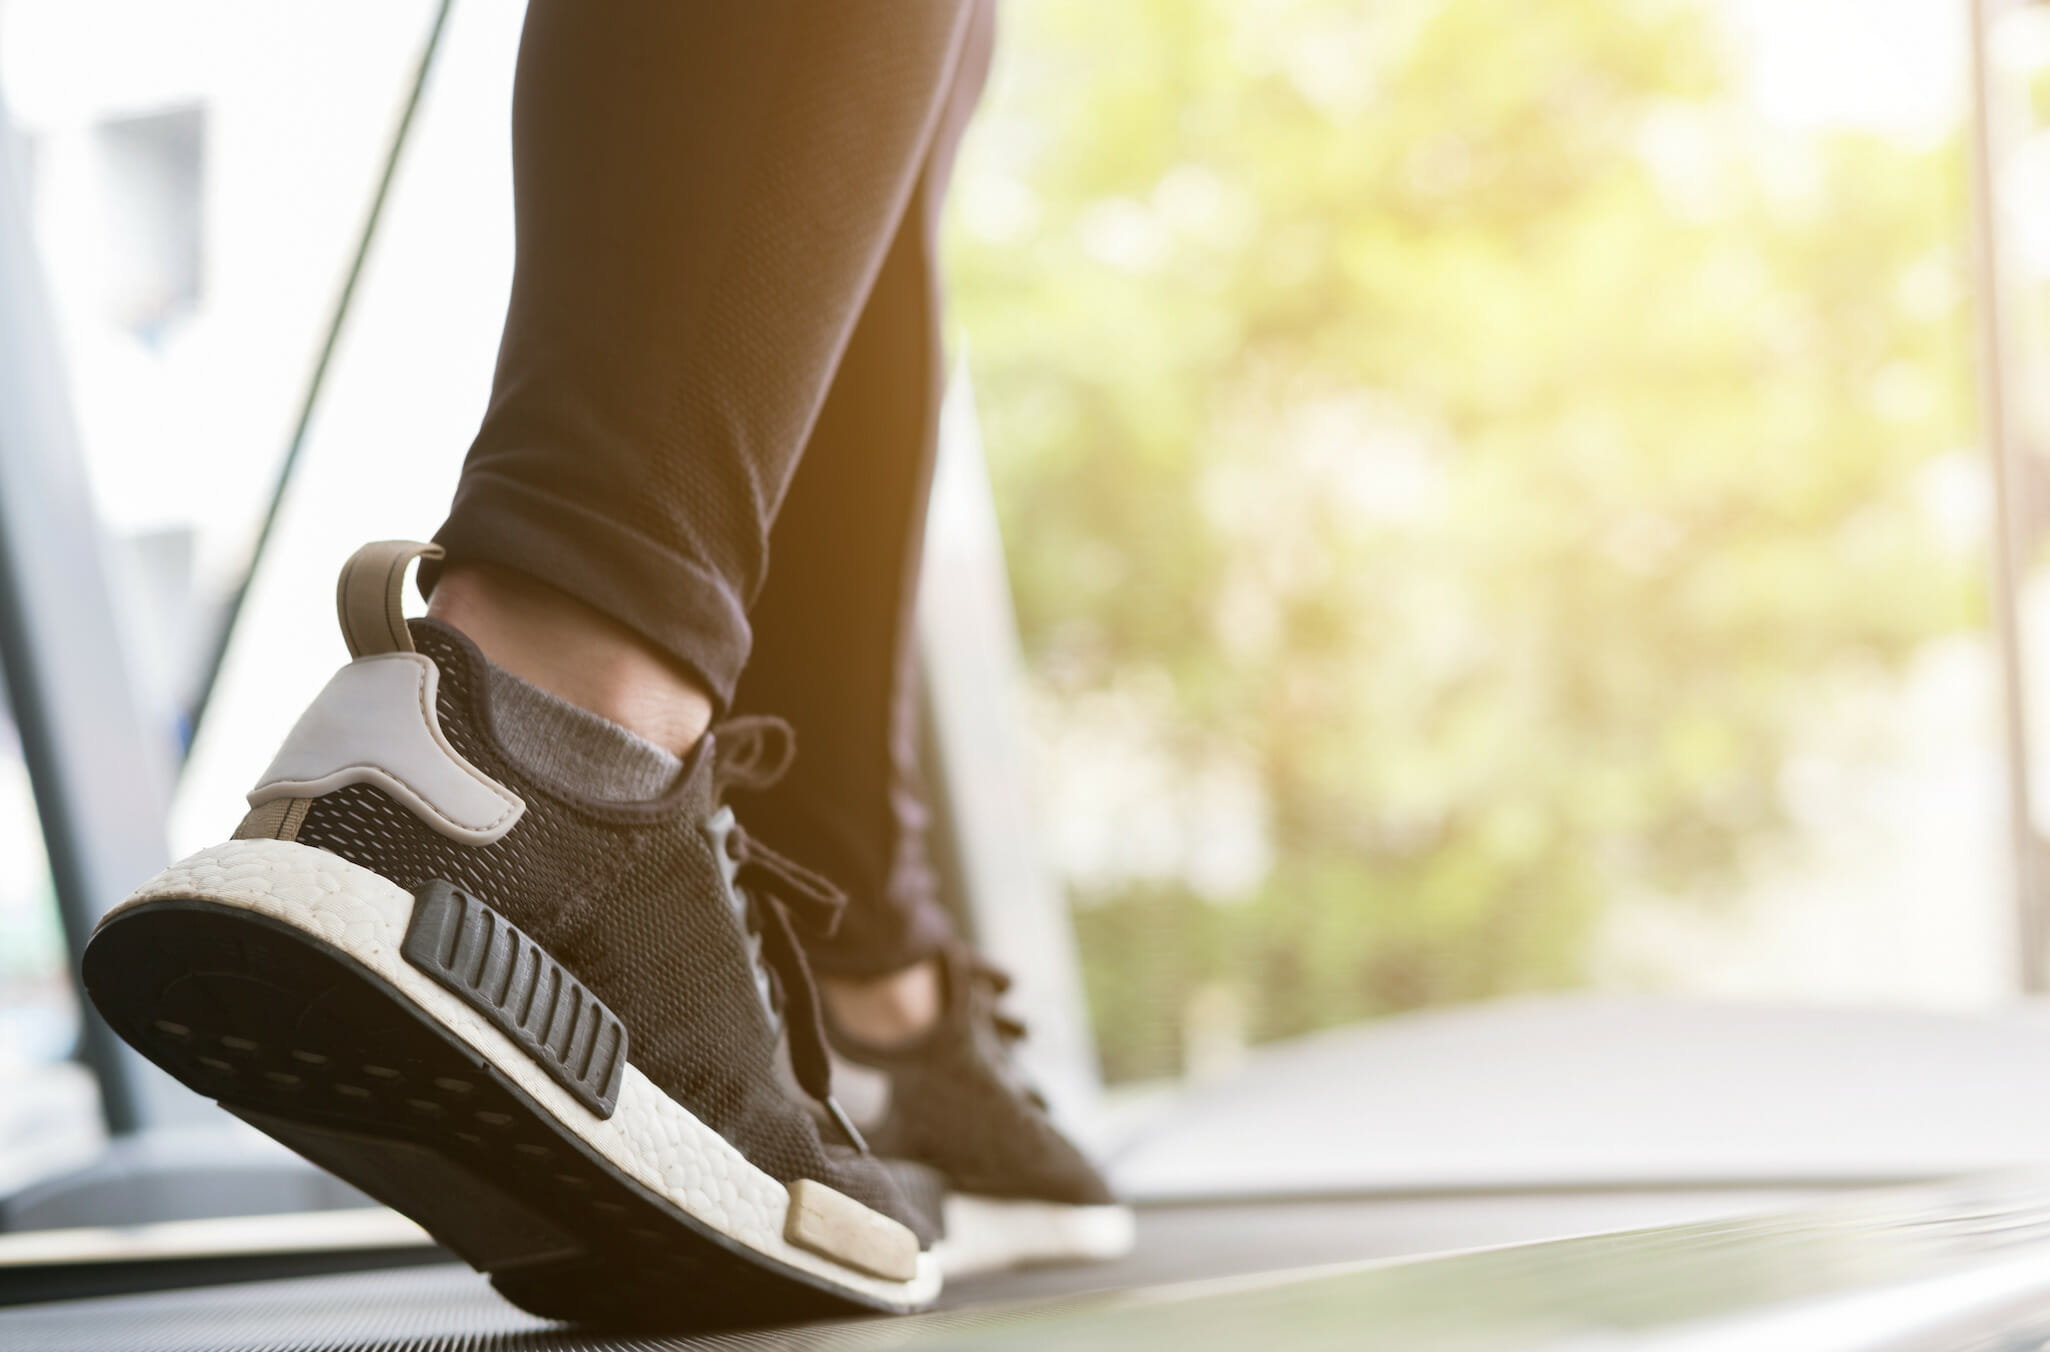 XTERRA TRX3500 treadmill review